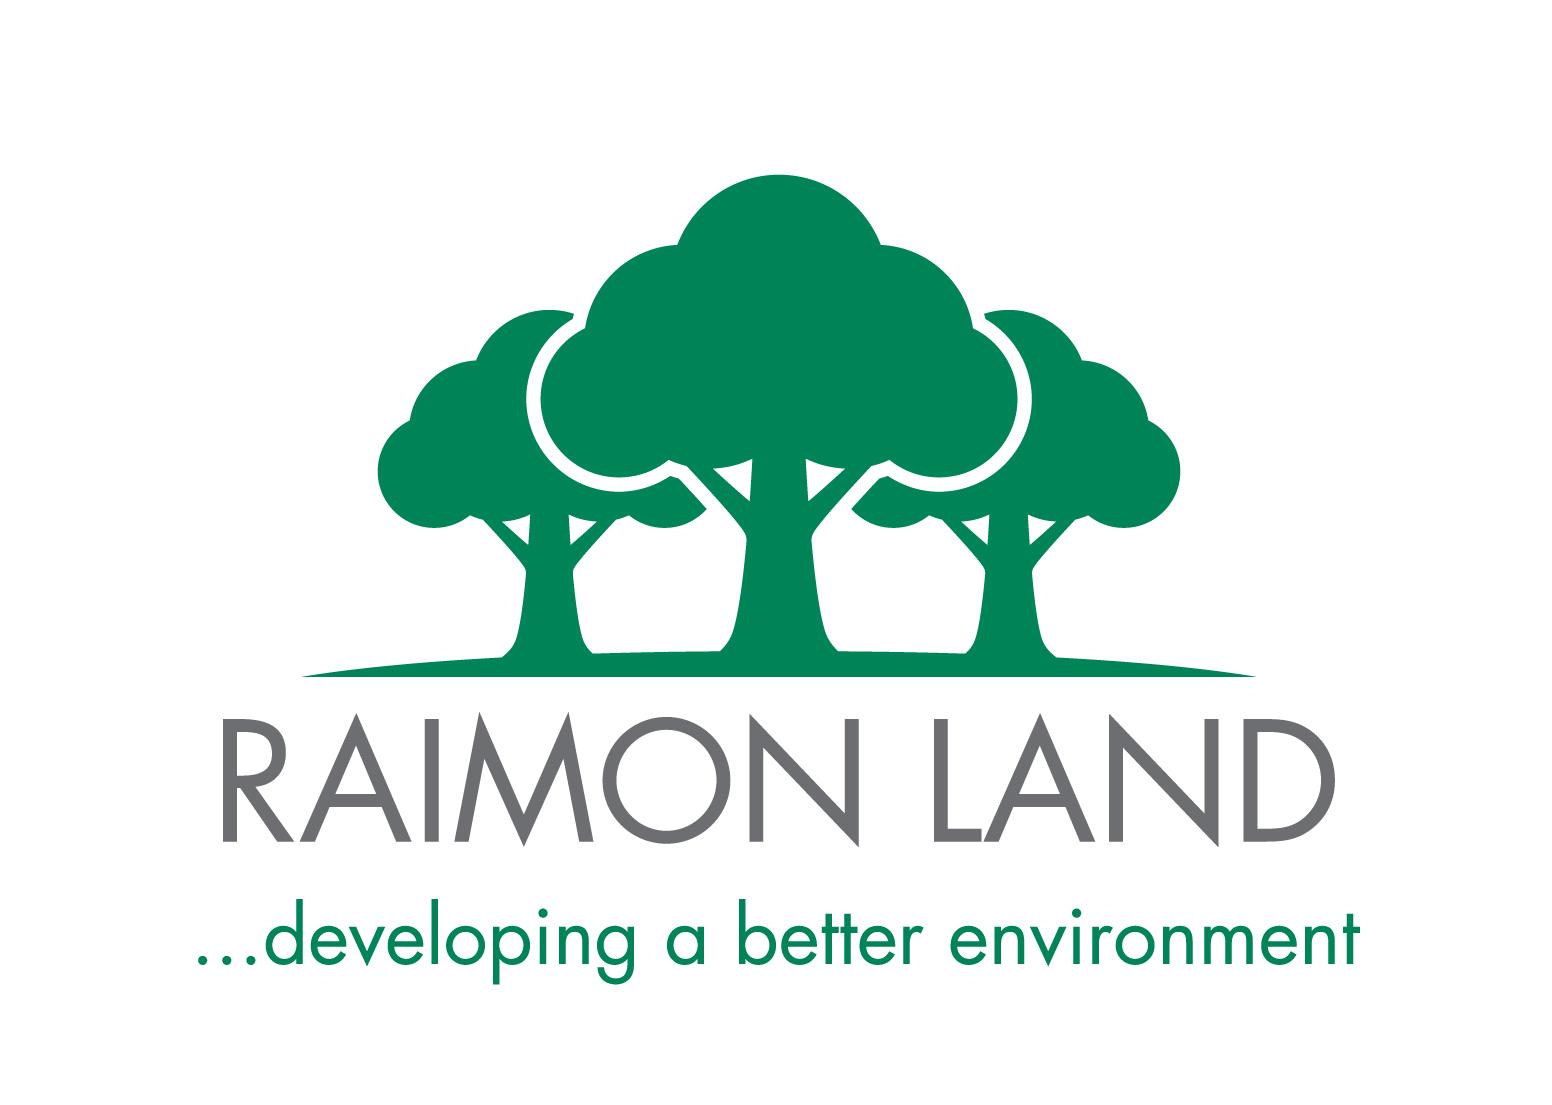 raimonland-logo